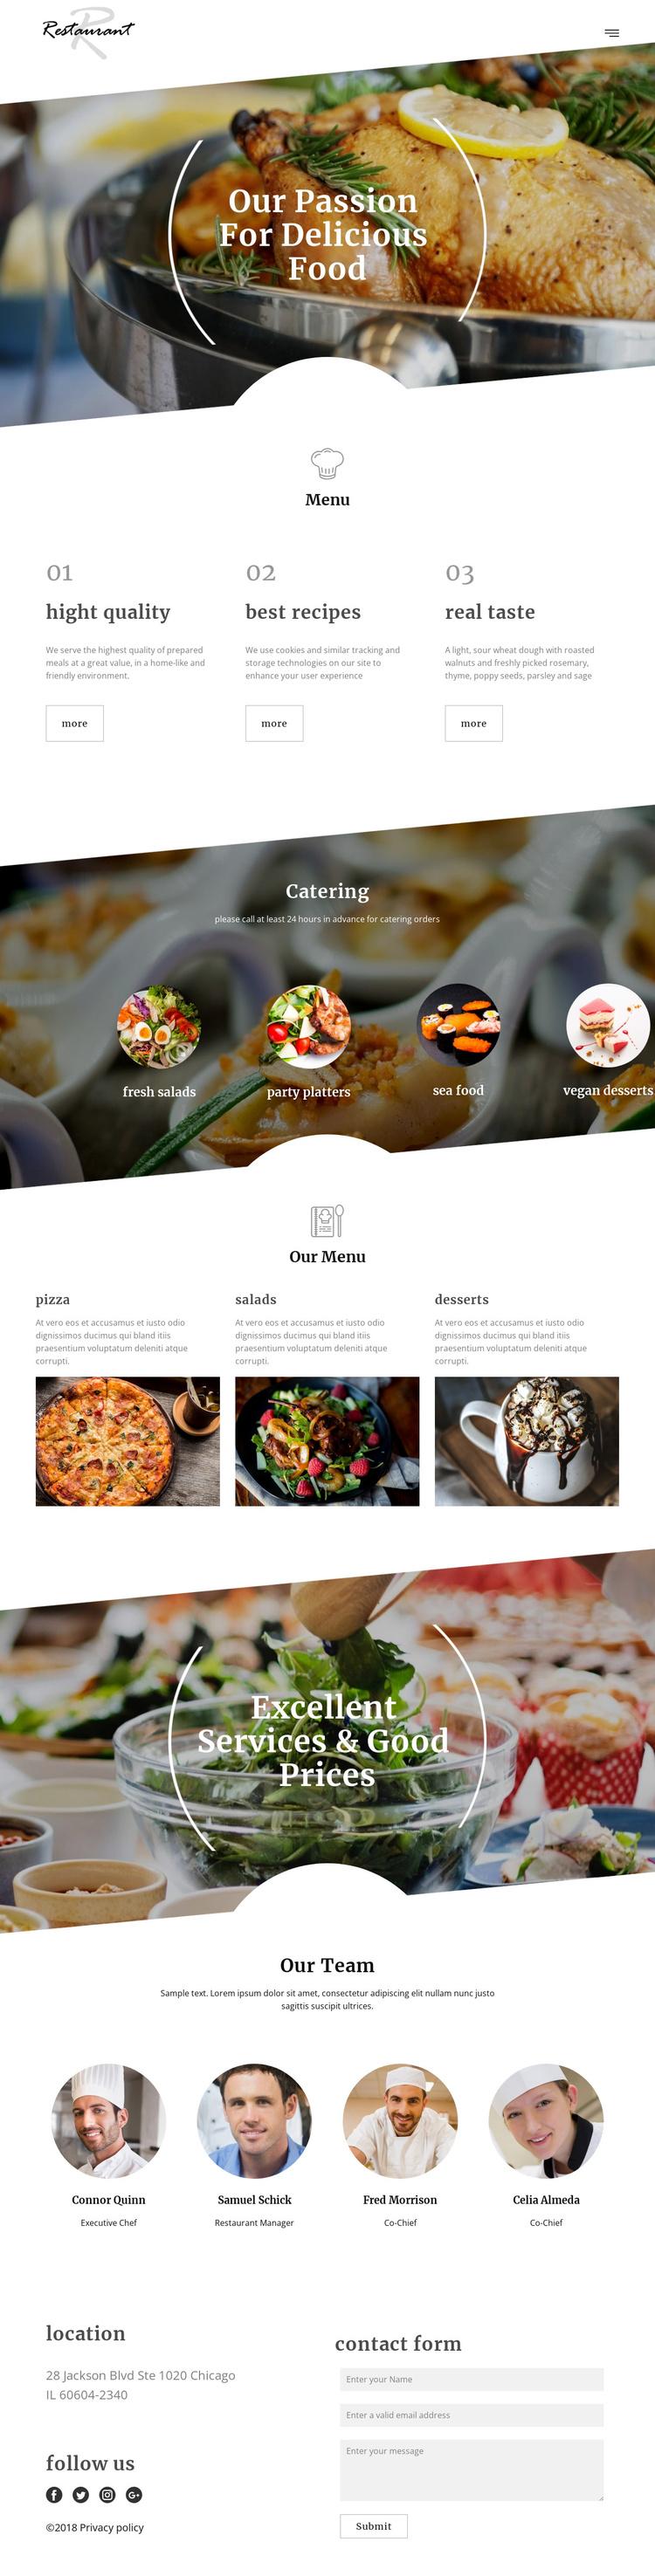 Executive chef recipes Joomla Template